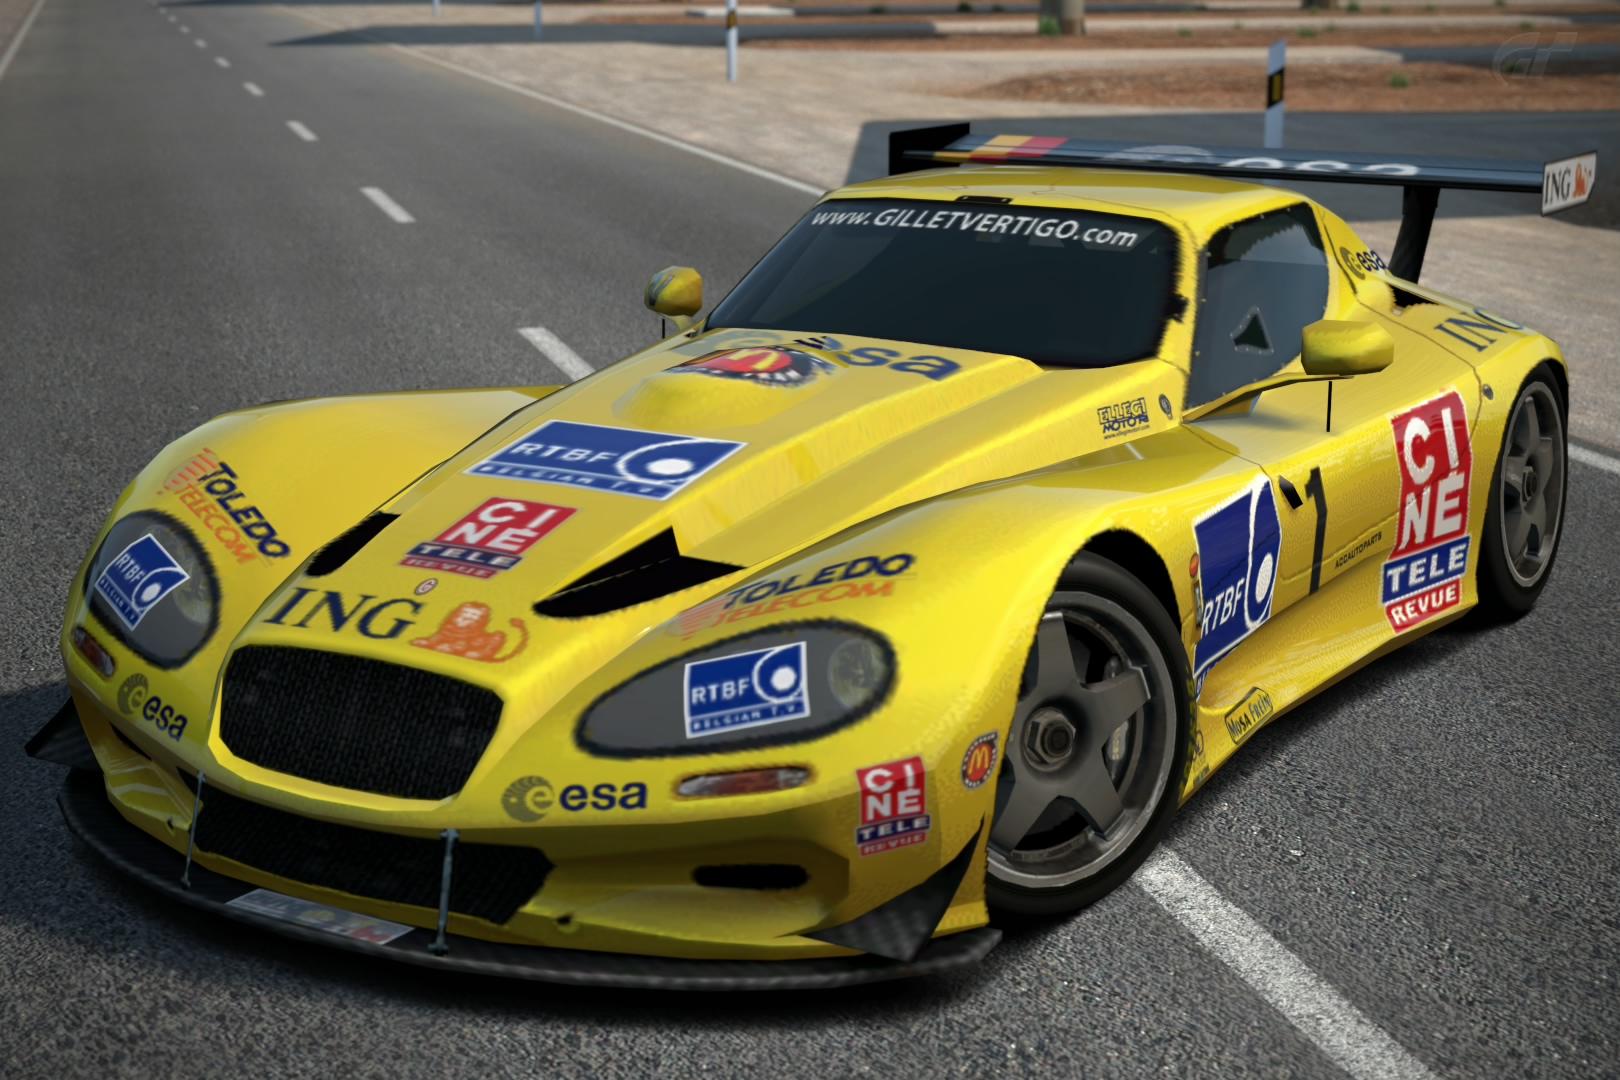 Turismo Car: Gillet Vertigo Race Car '04